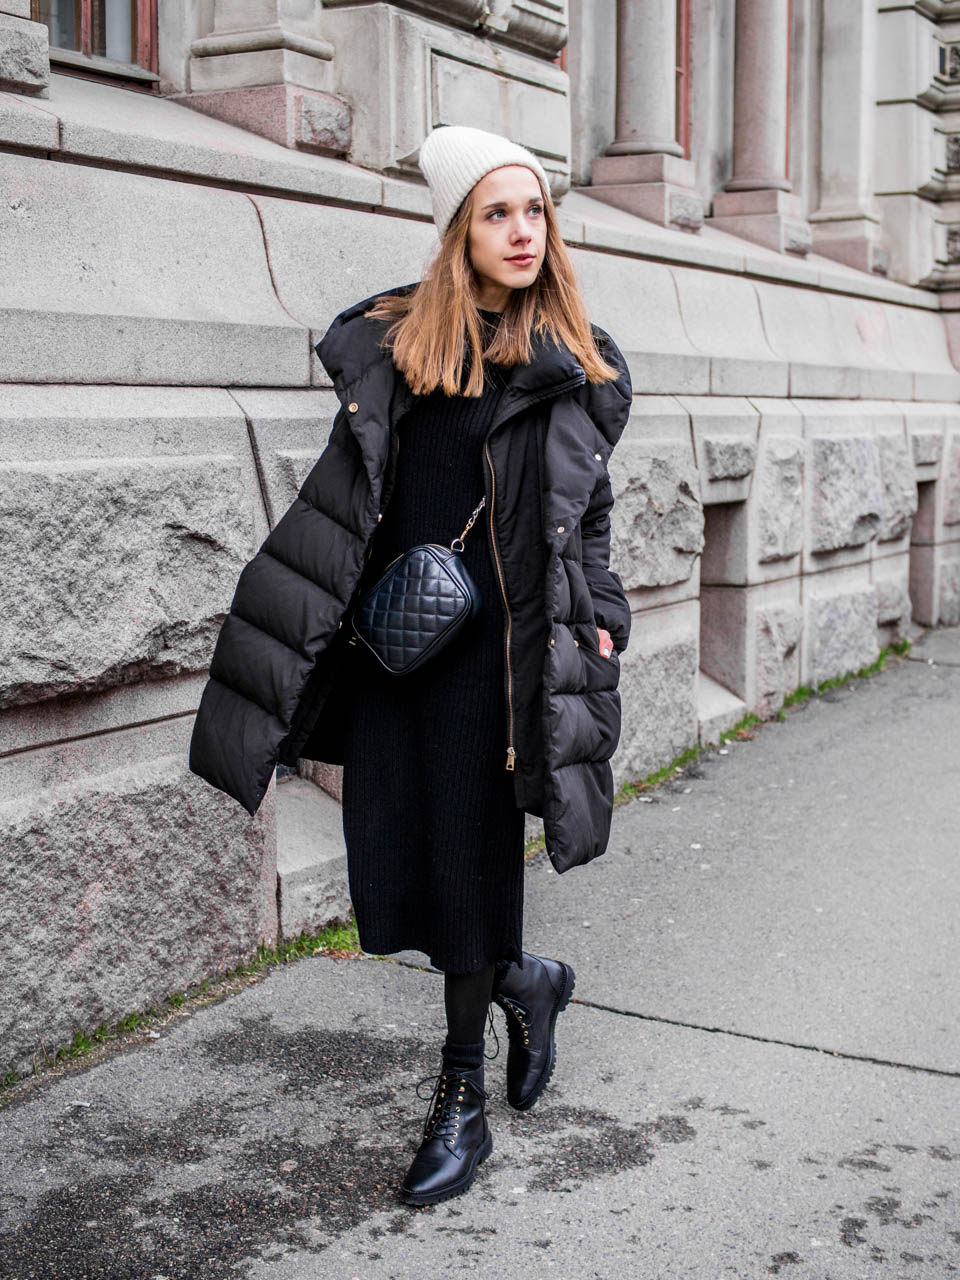 How to style lace up leather boots - Kuinka pukea nauhalliset nilkkurit